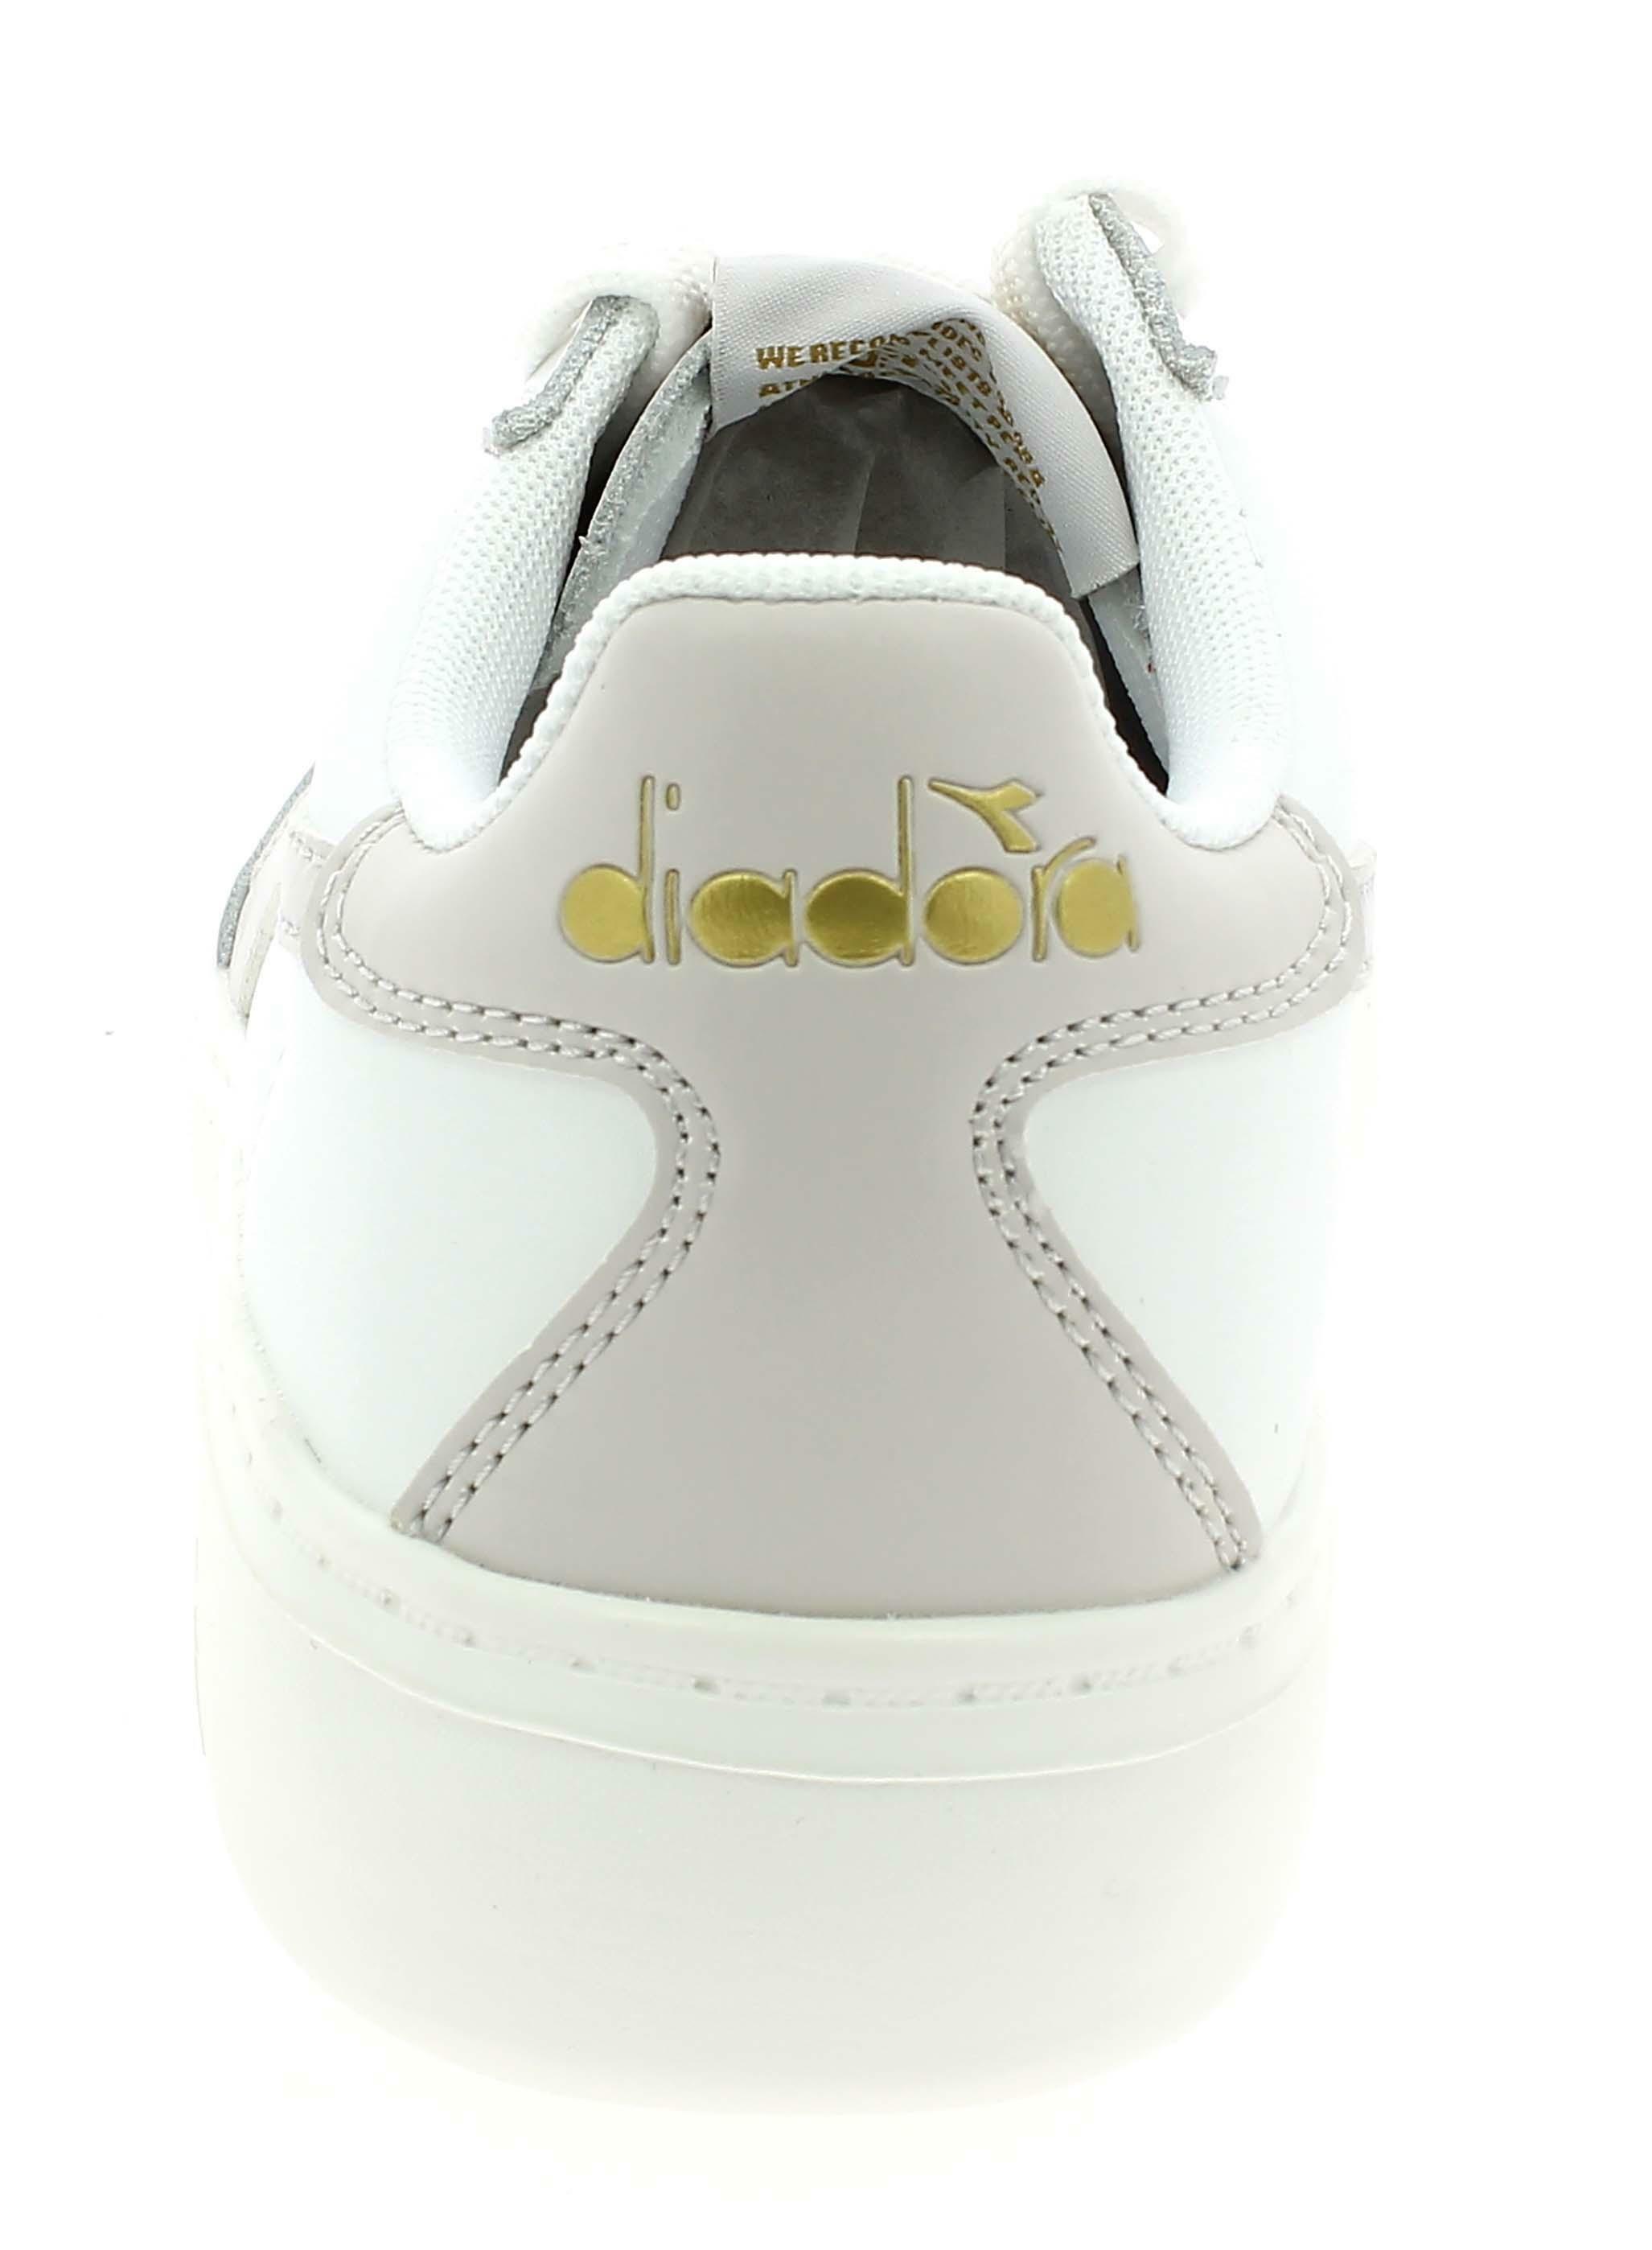 diadora b elite wide scarpe sportive donna bianche 174331c7904